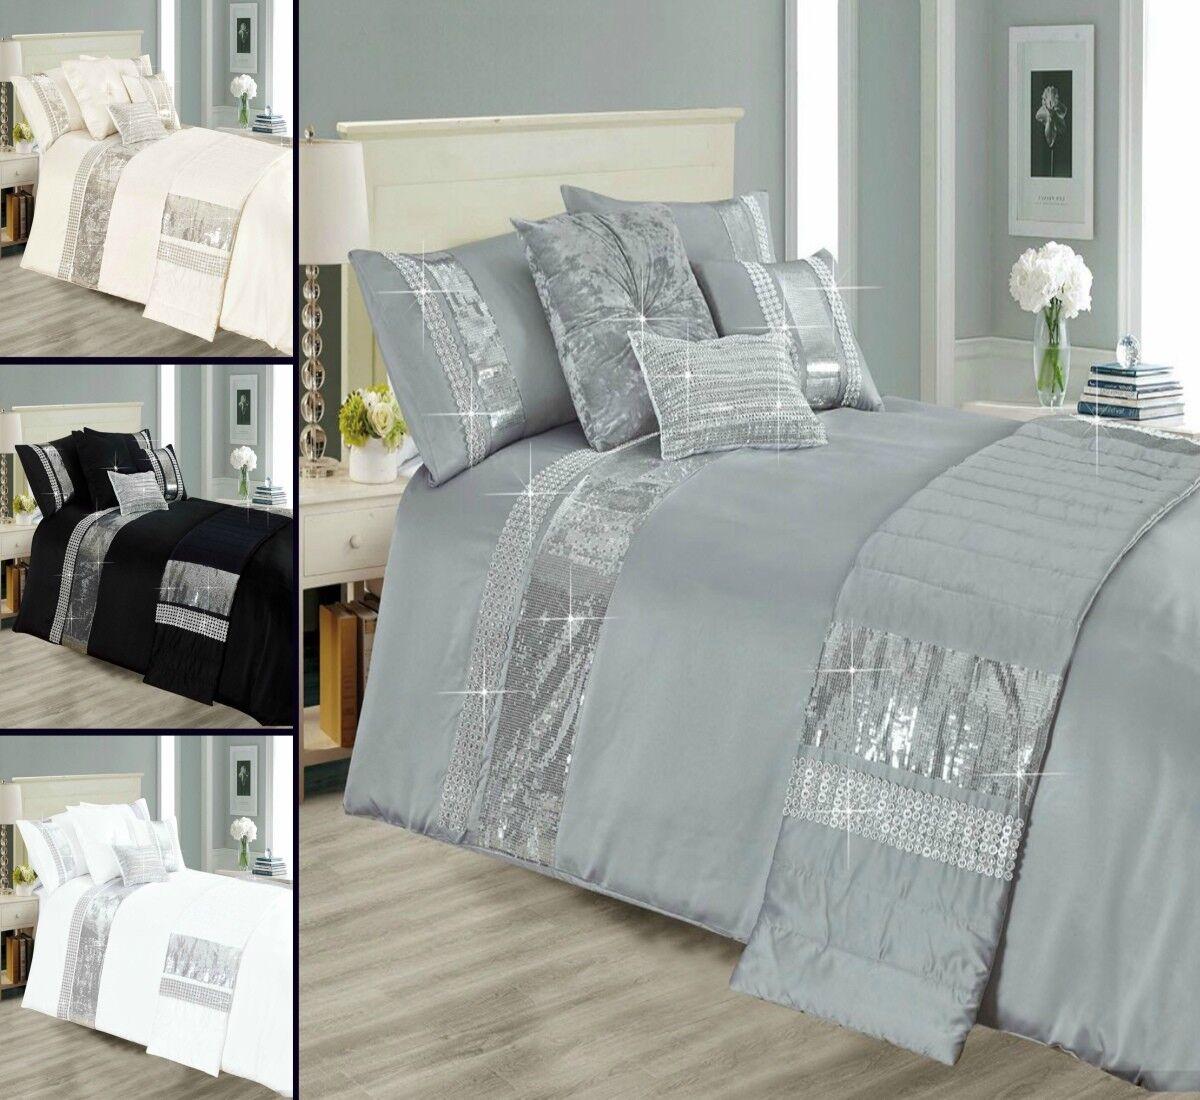 5 Pieces Glittery Sequin Duvet Quilt Cover Complete Bedding Set Premium Quality